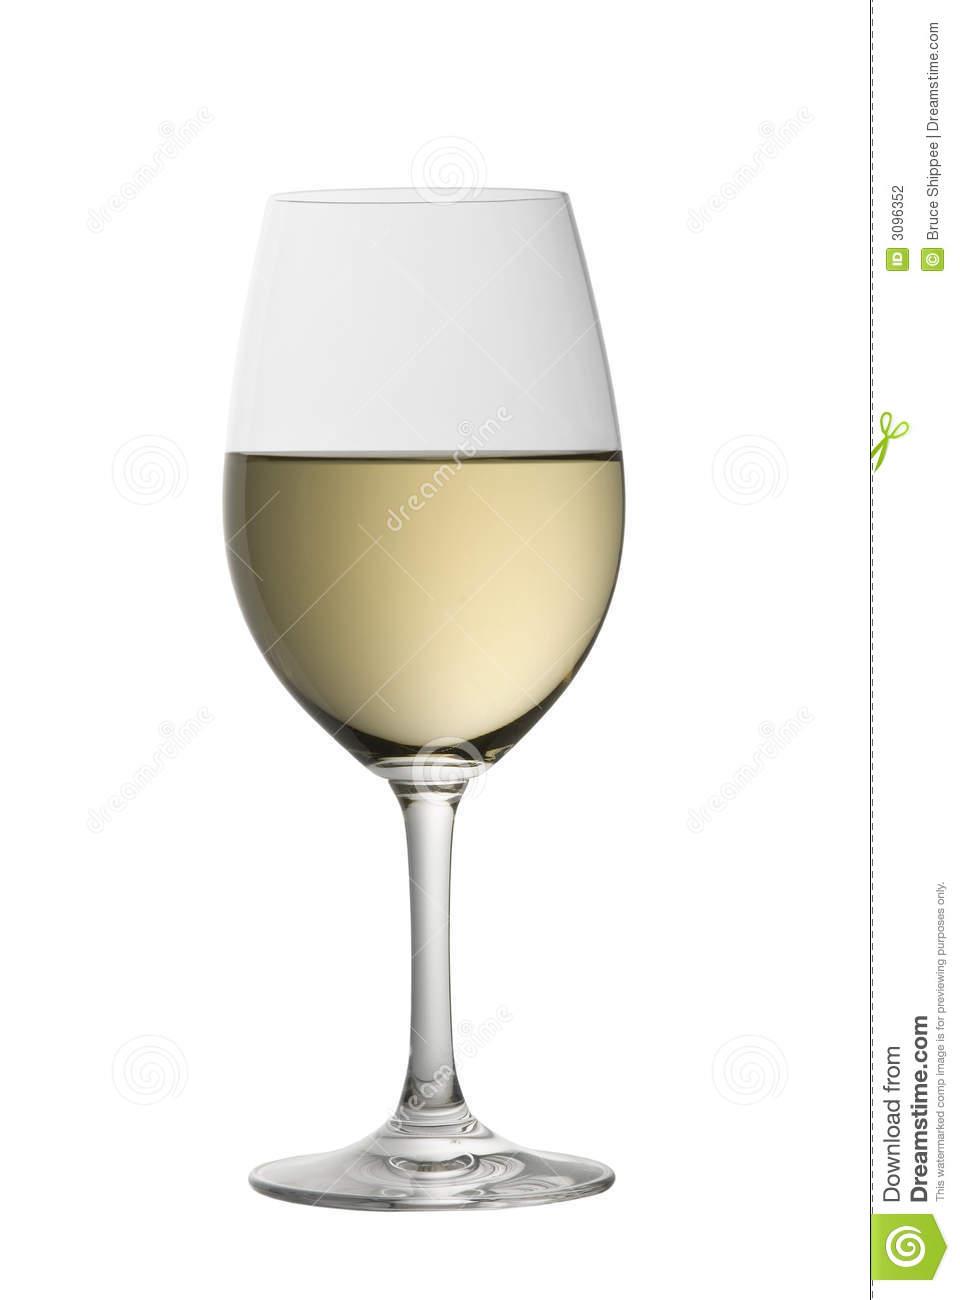 Glass Of Chardonnay Stock Photography.